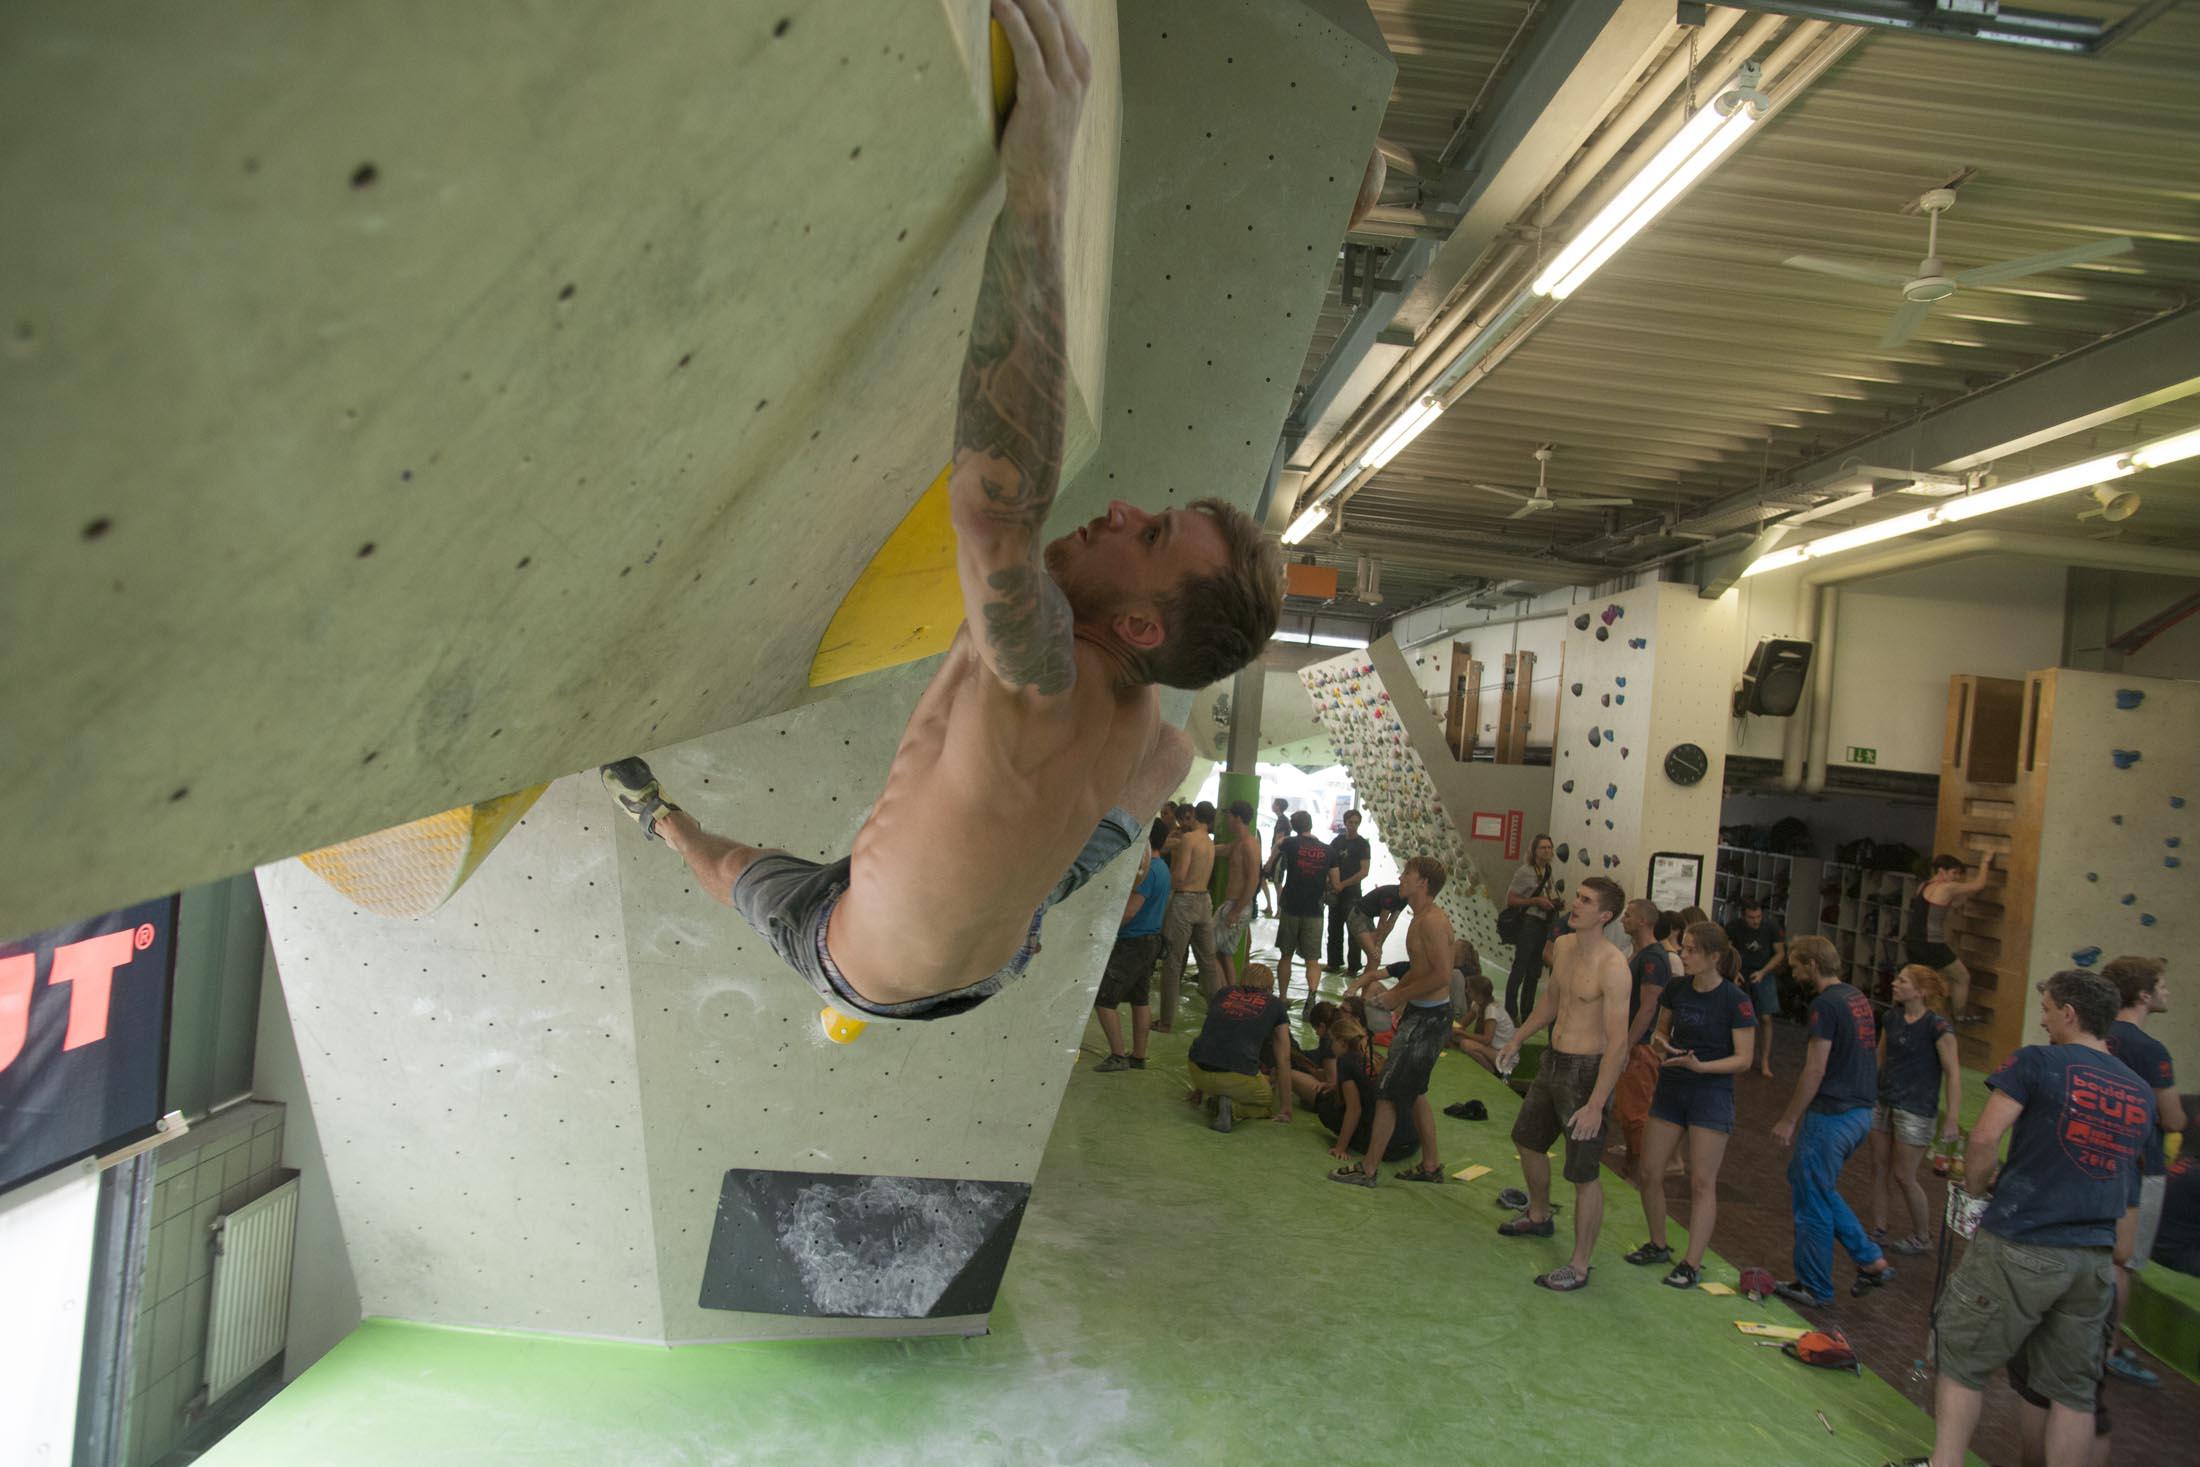 Quali, internationaler bouldercup Frankenjura 2016, BLOCKHELDEN Erlangen, Mammut, Bergfreunde.de, Boulderwettkampf07092016370